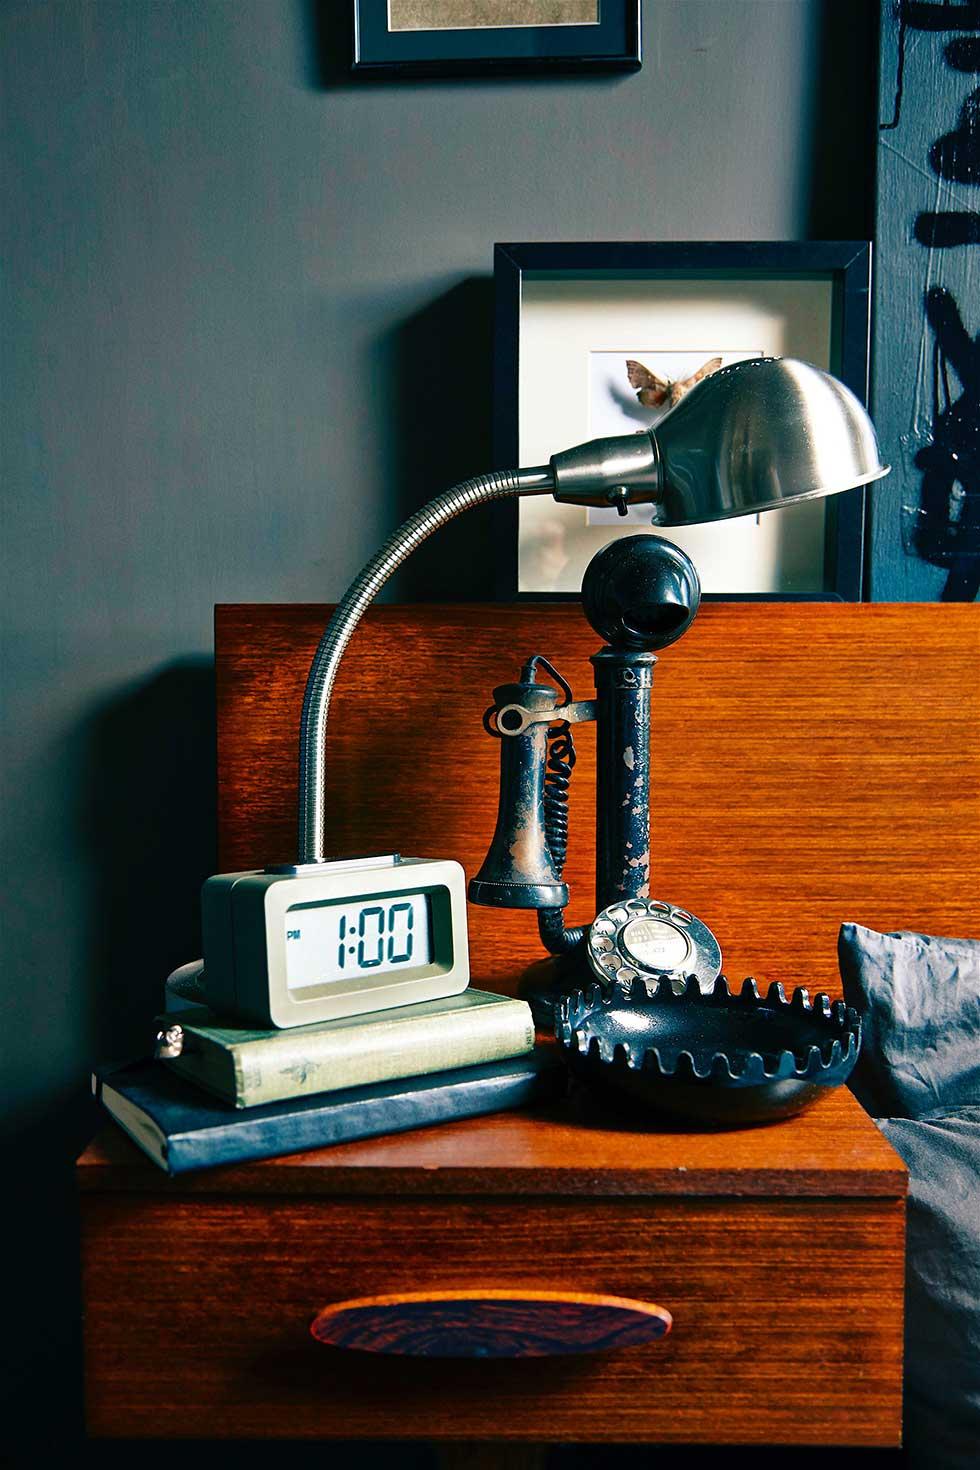 Duplex apartment mid-century bedaide table in dark bedroom